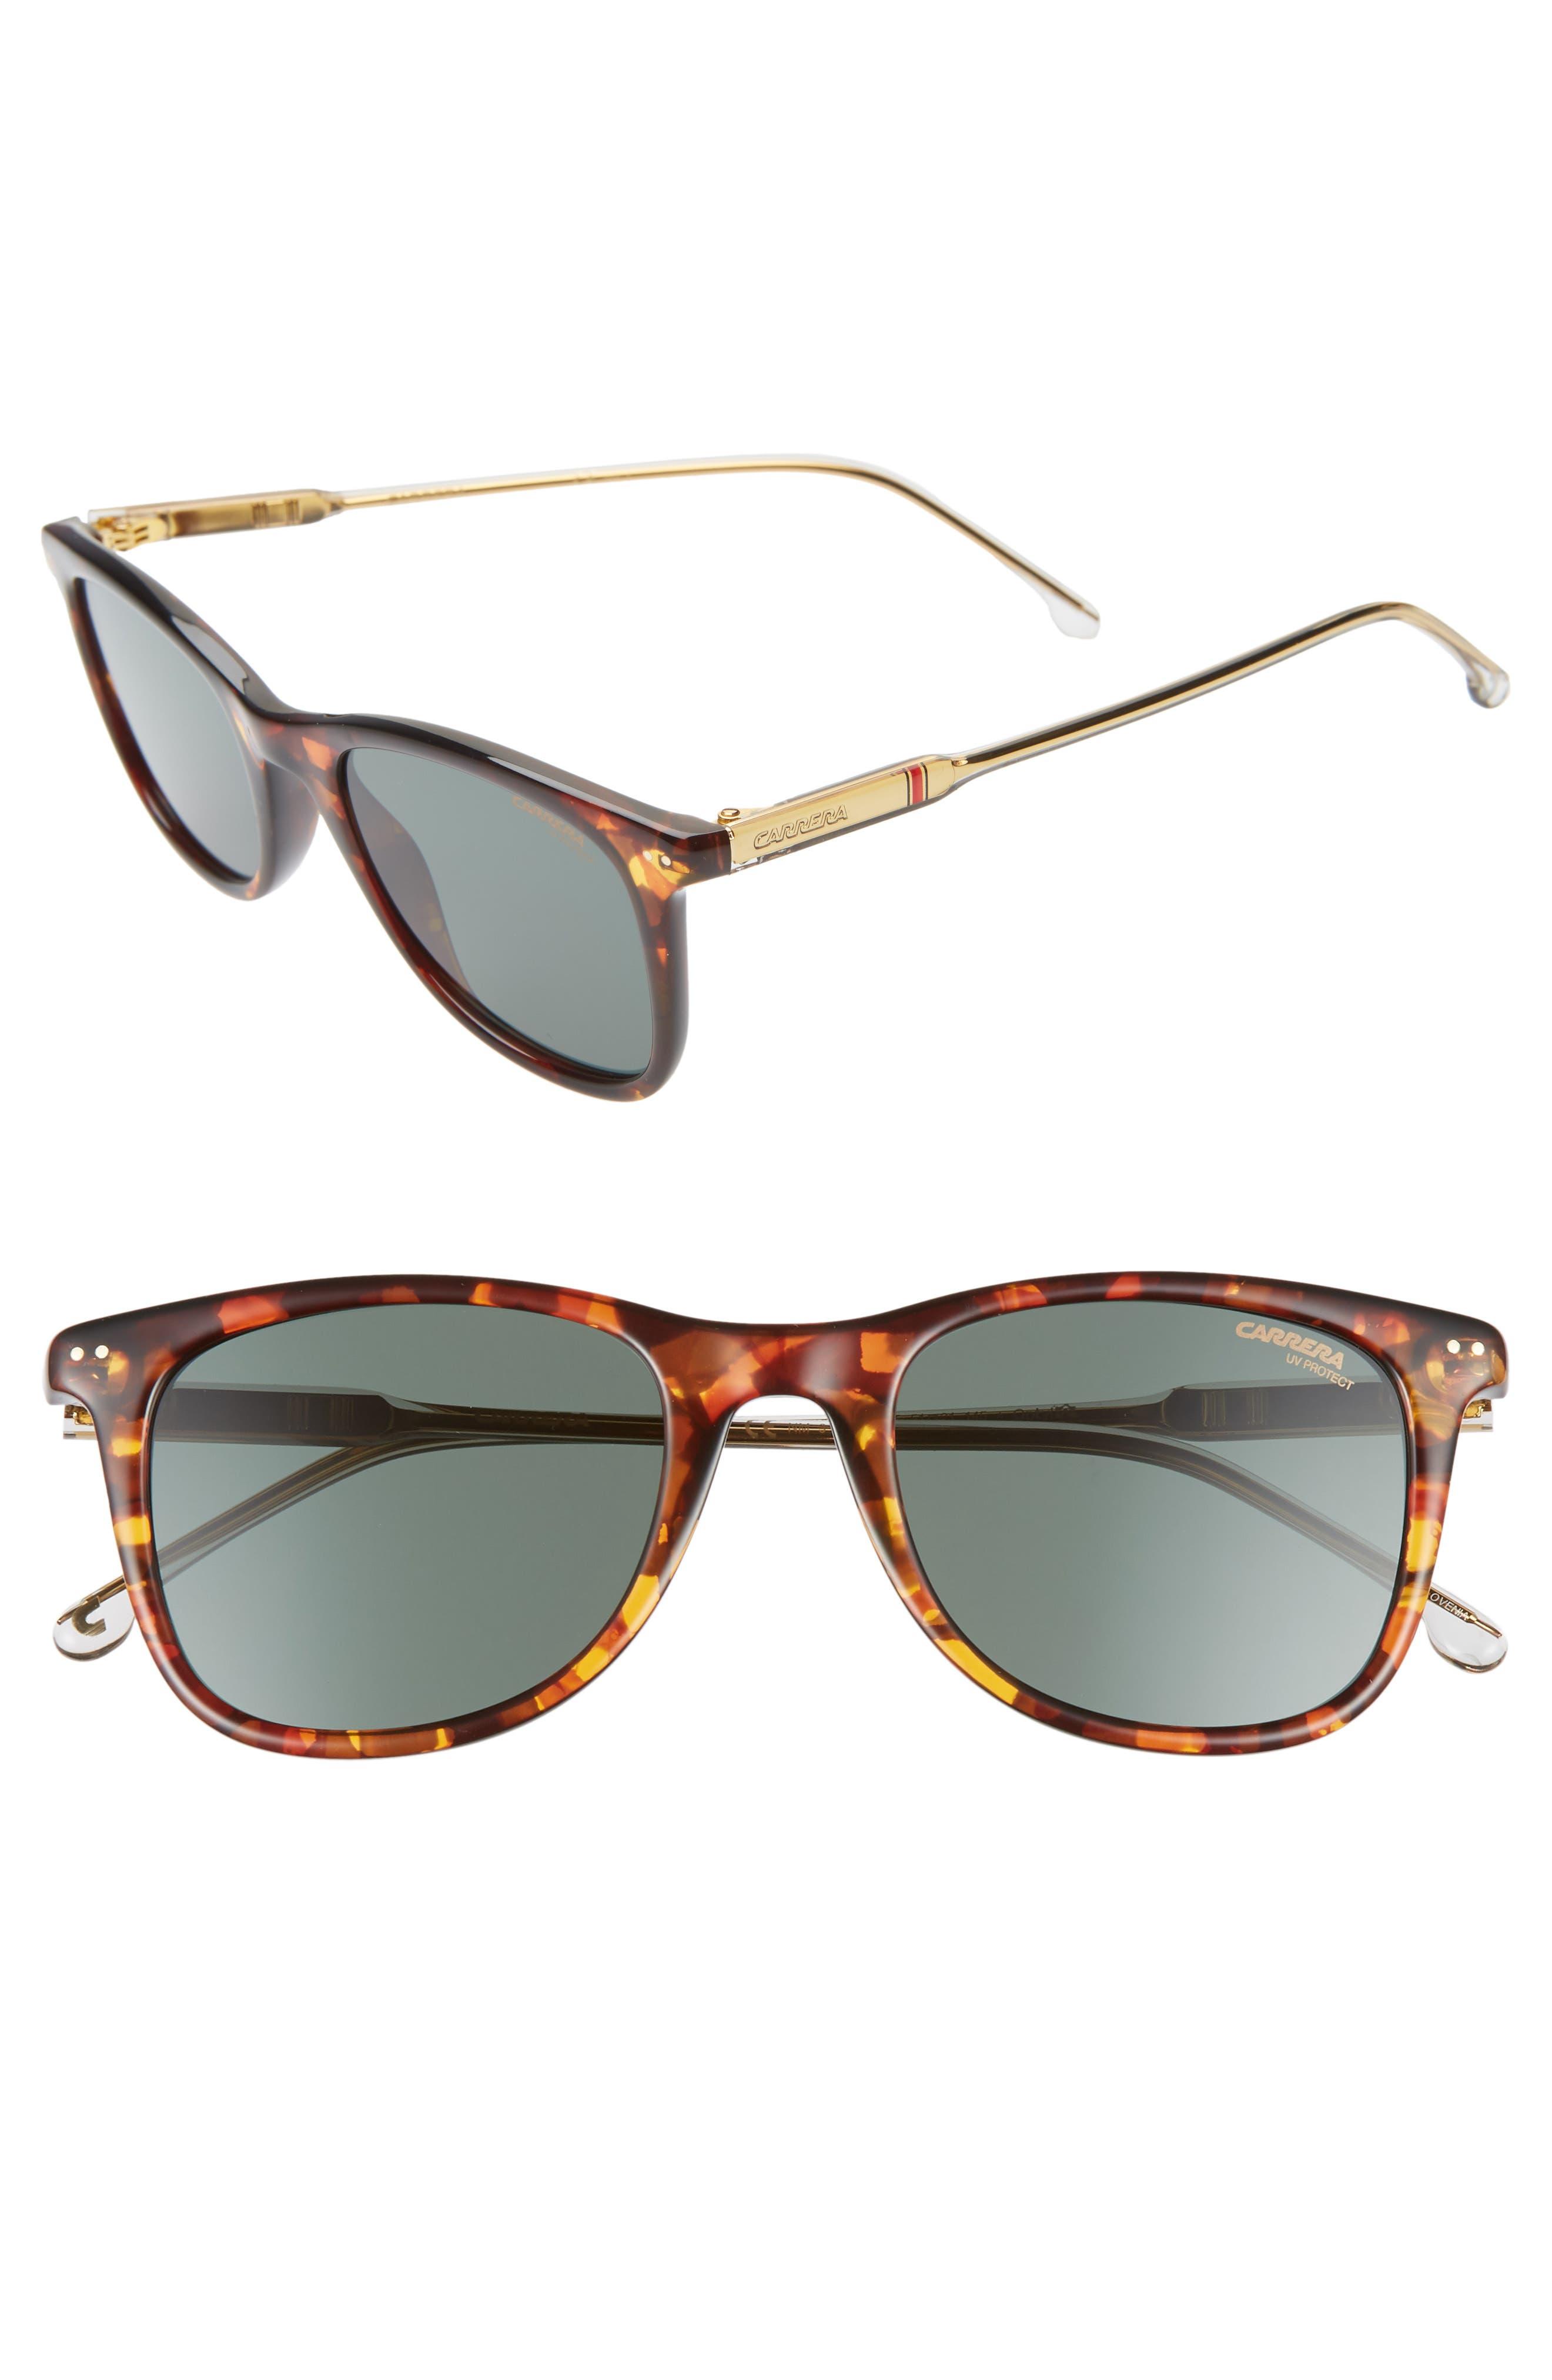 Carrera Eyewear 51Mm Sunglasses - Dark Havana